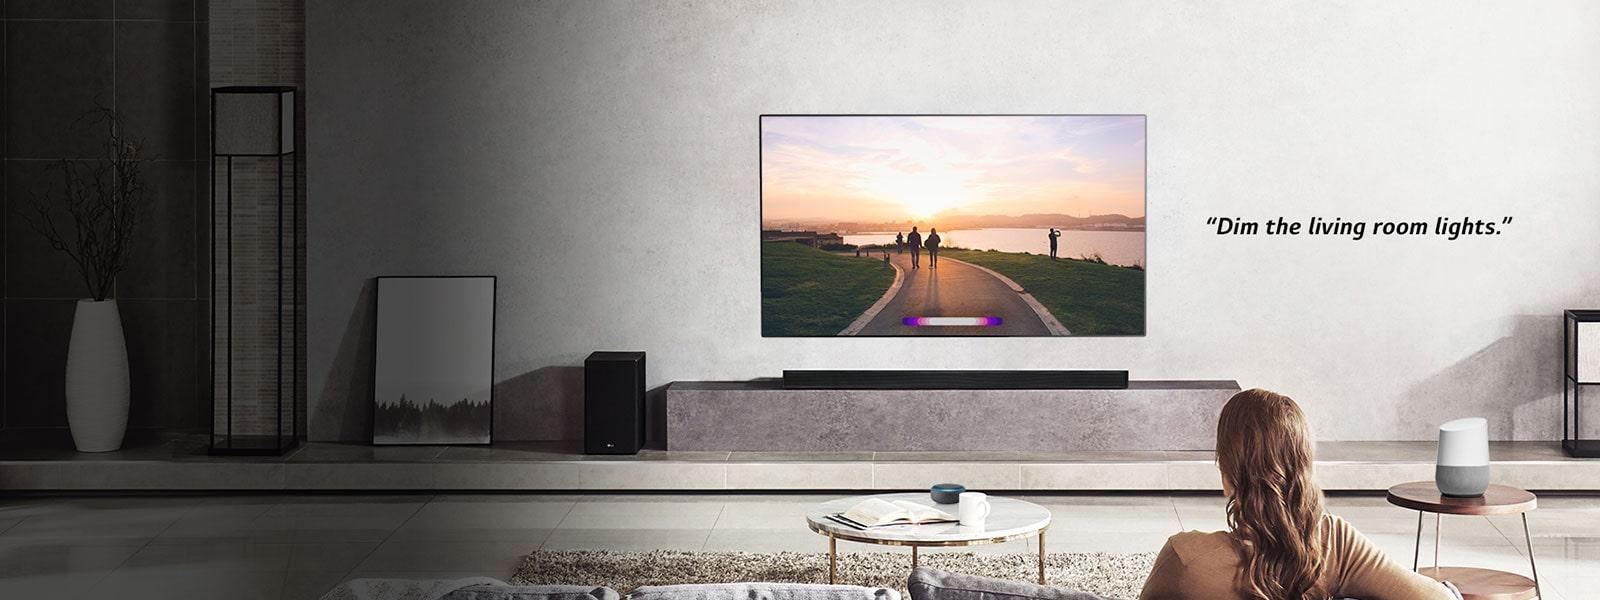 LG Smart TVs: Internet Ready, HDR, UHD TVs & more | LG USA